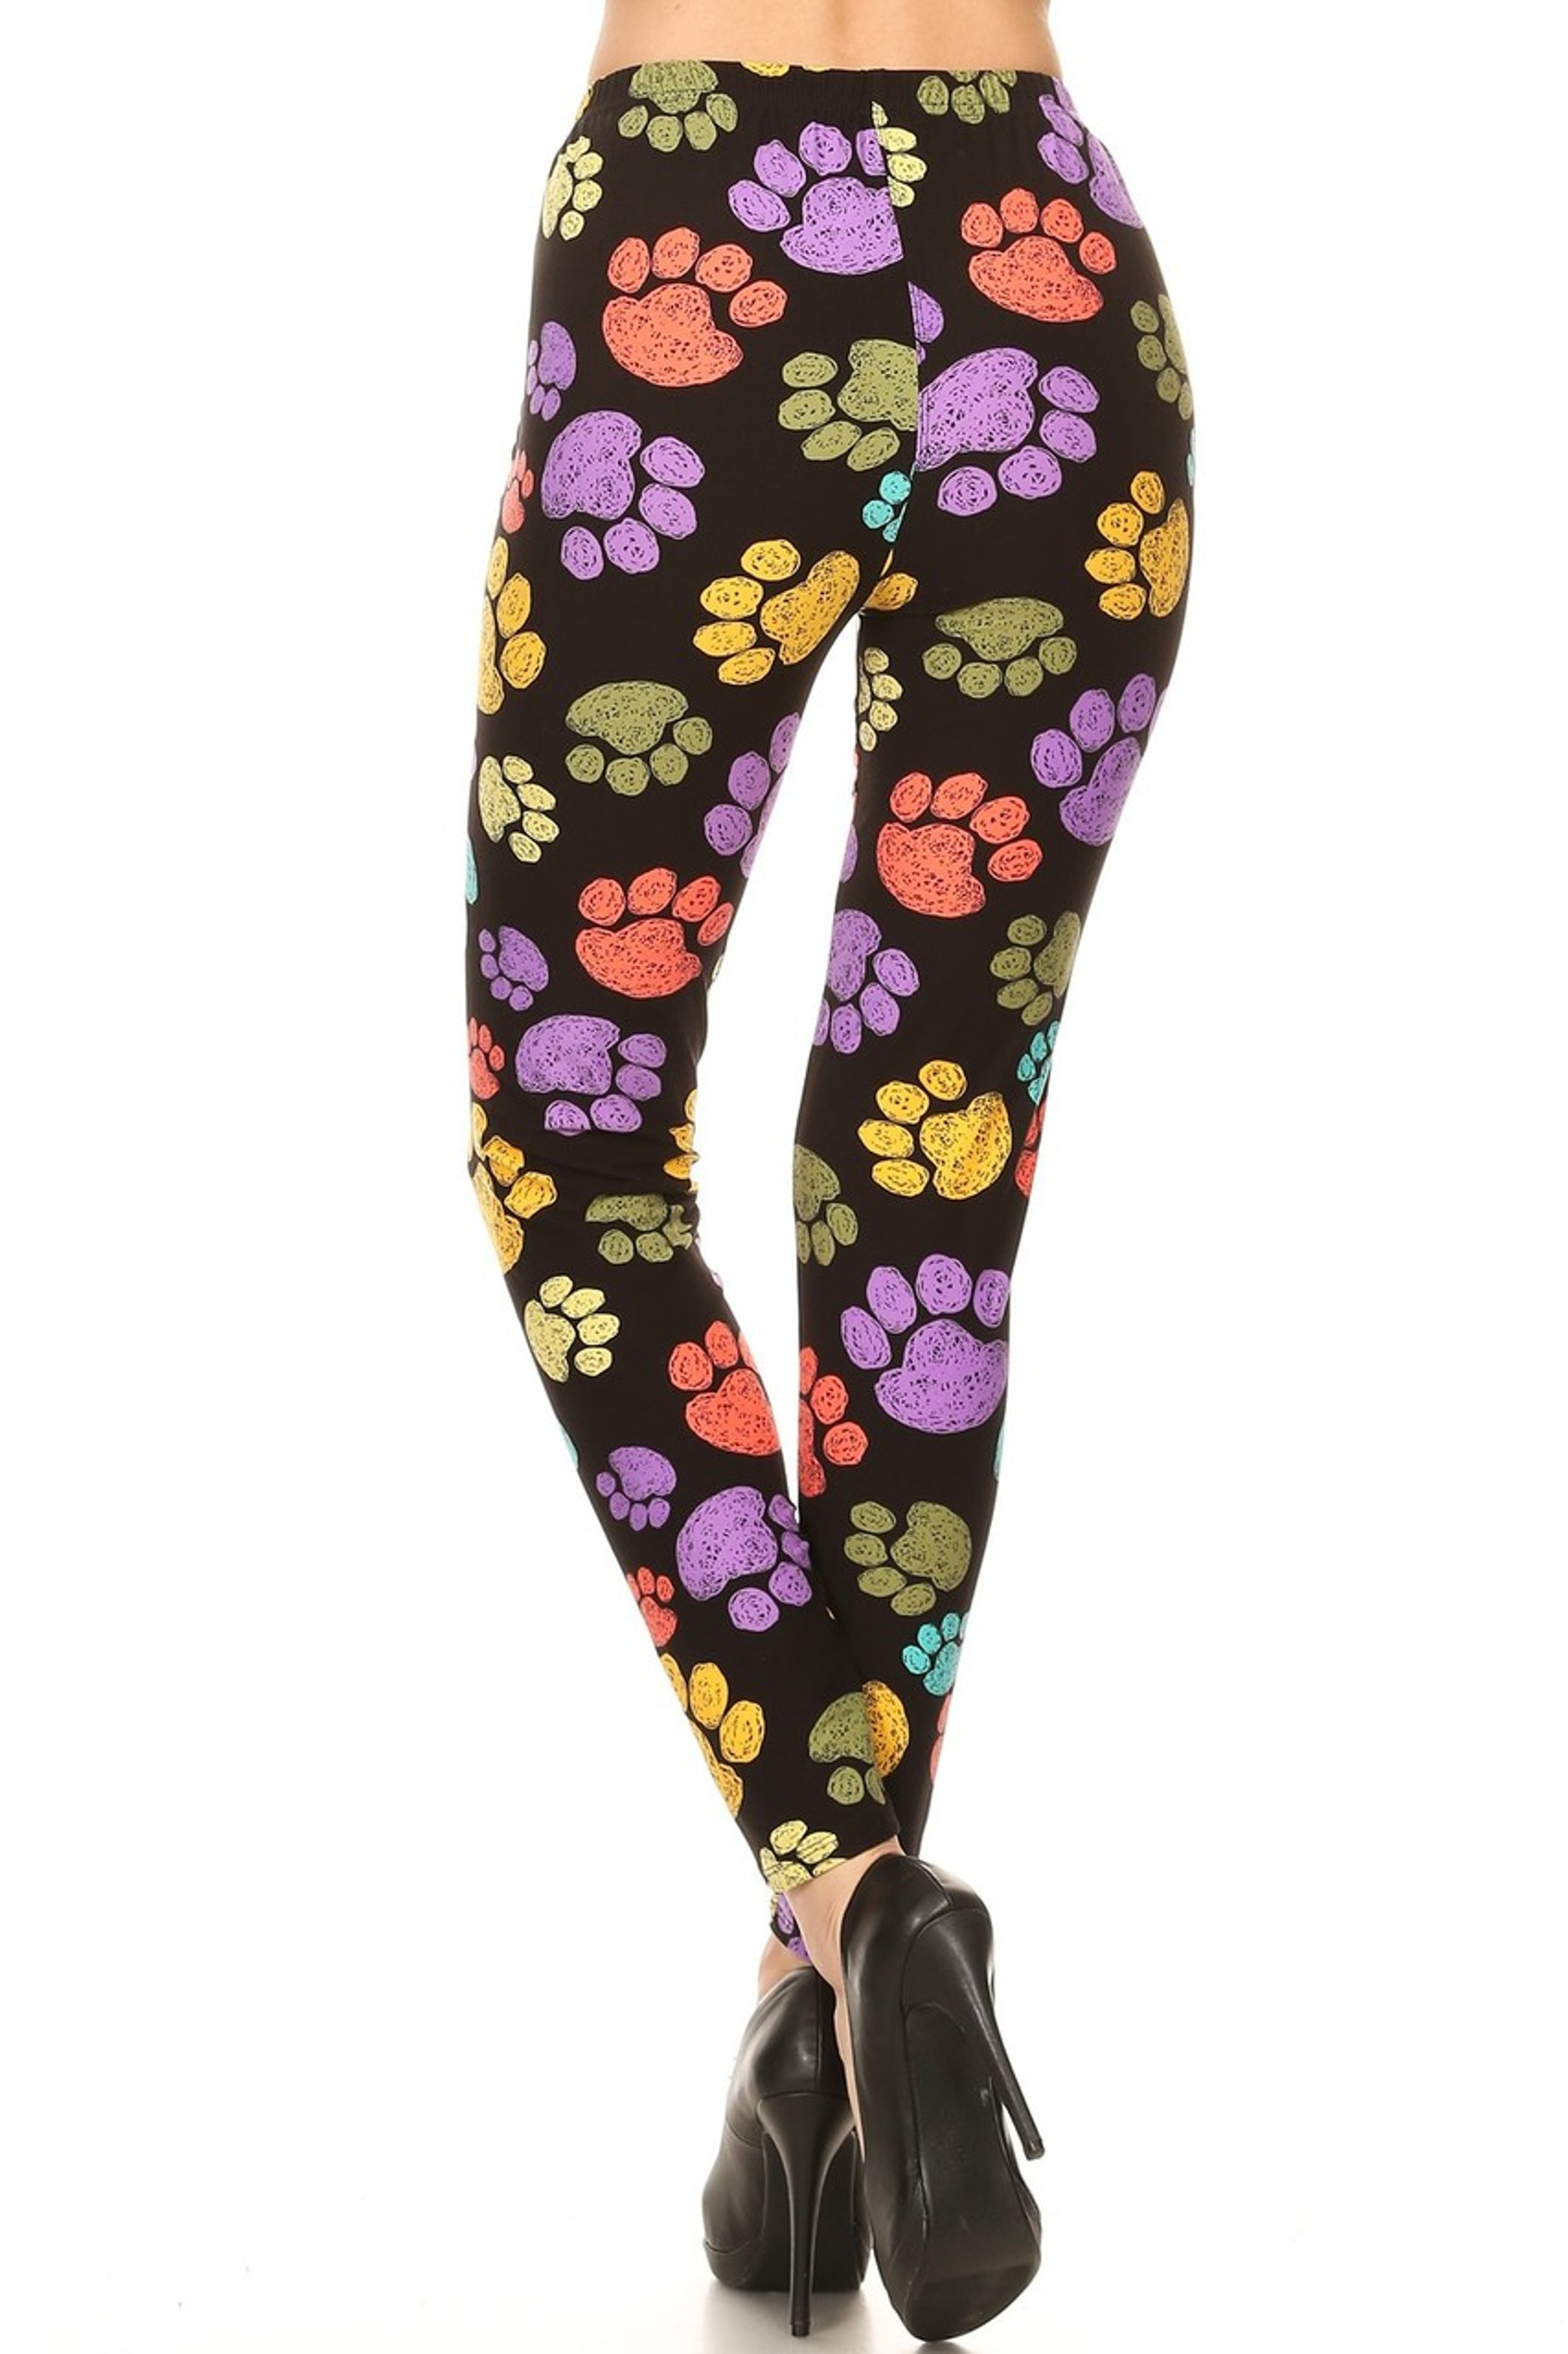 Brushed Colorful Paw Print Leggings - YCC